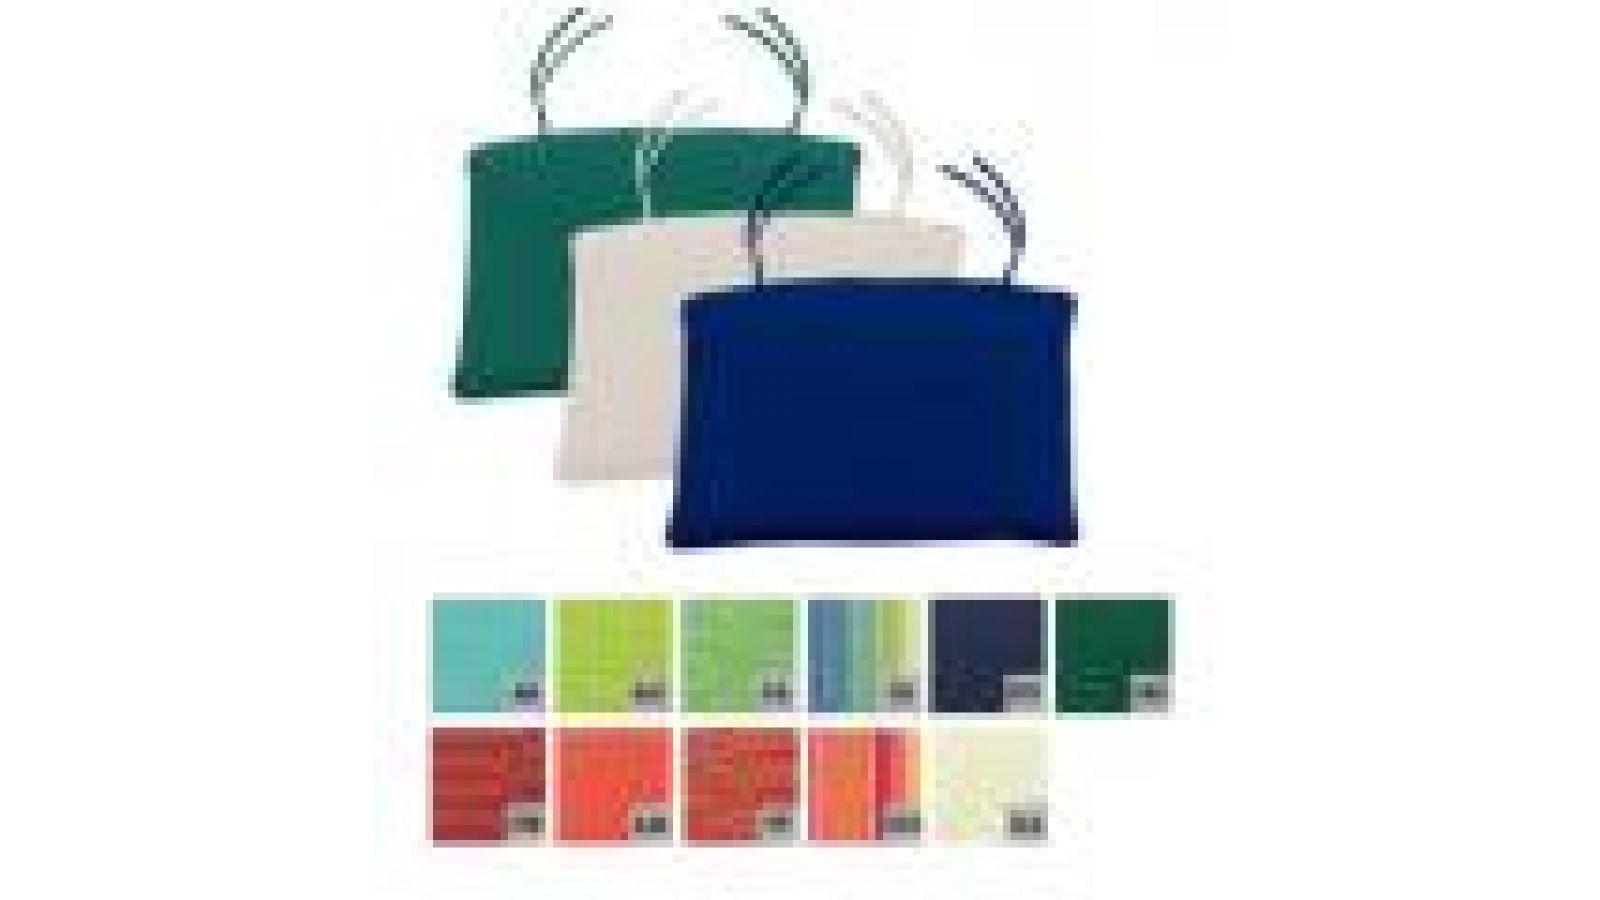 Sunbrella Adirondack Cushions